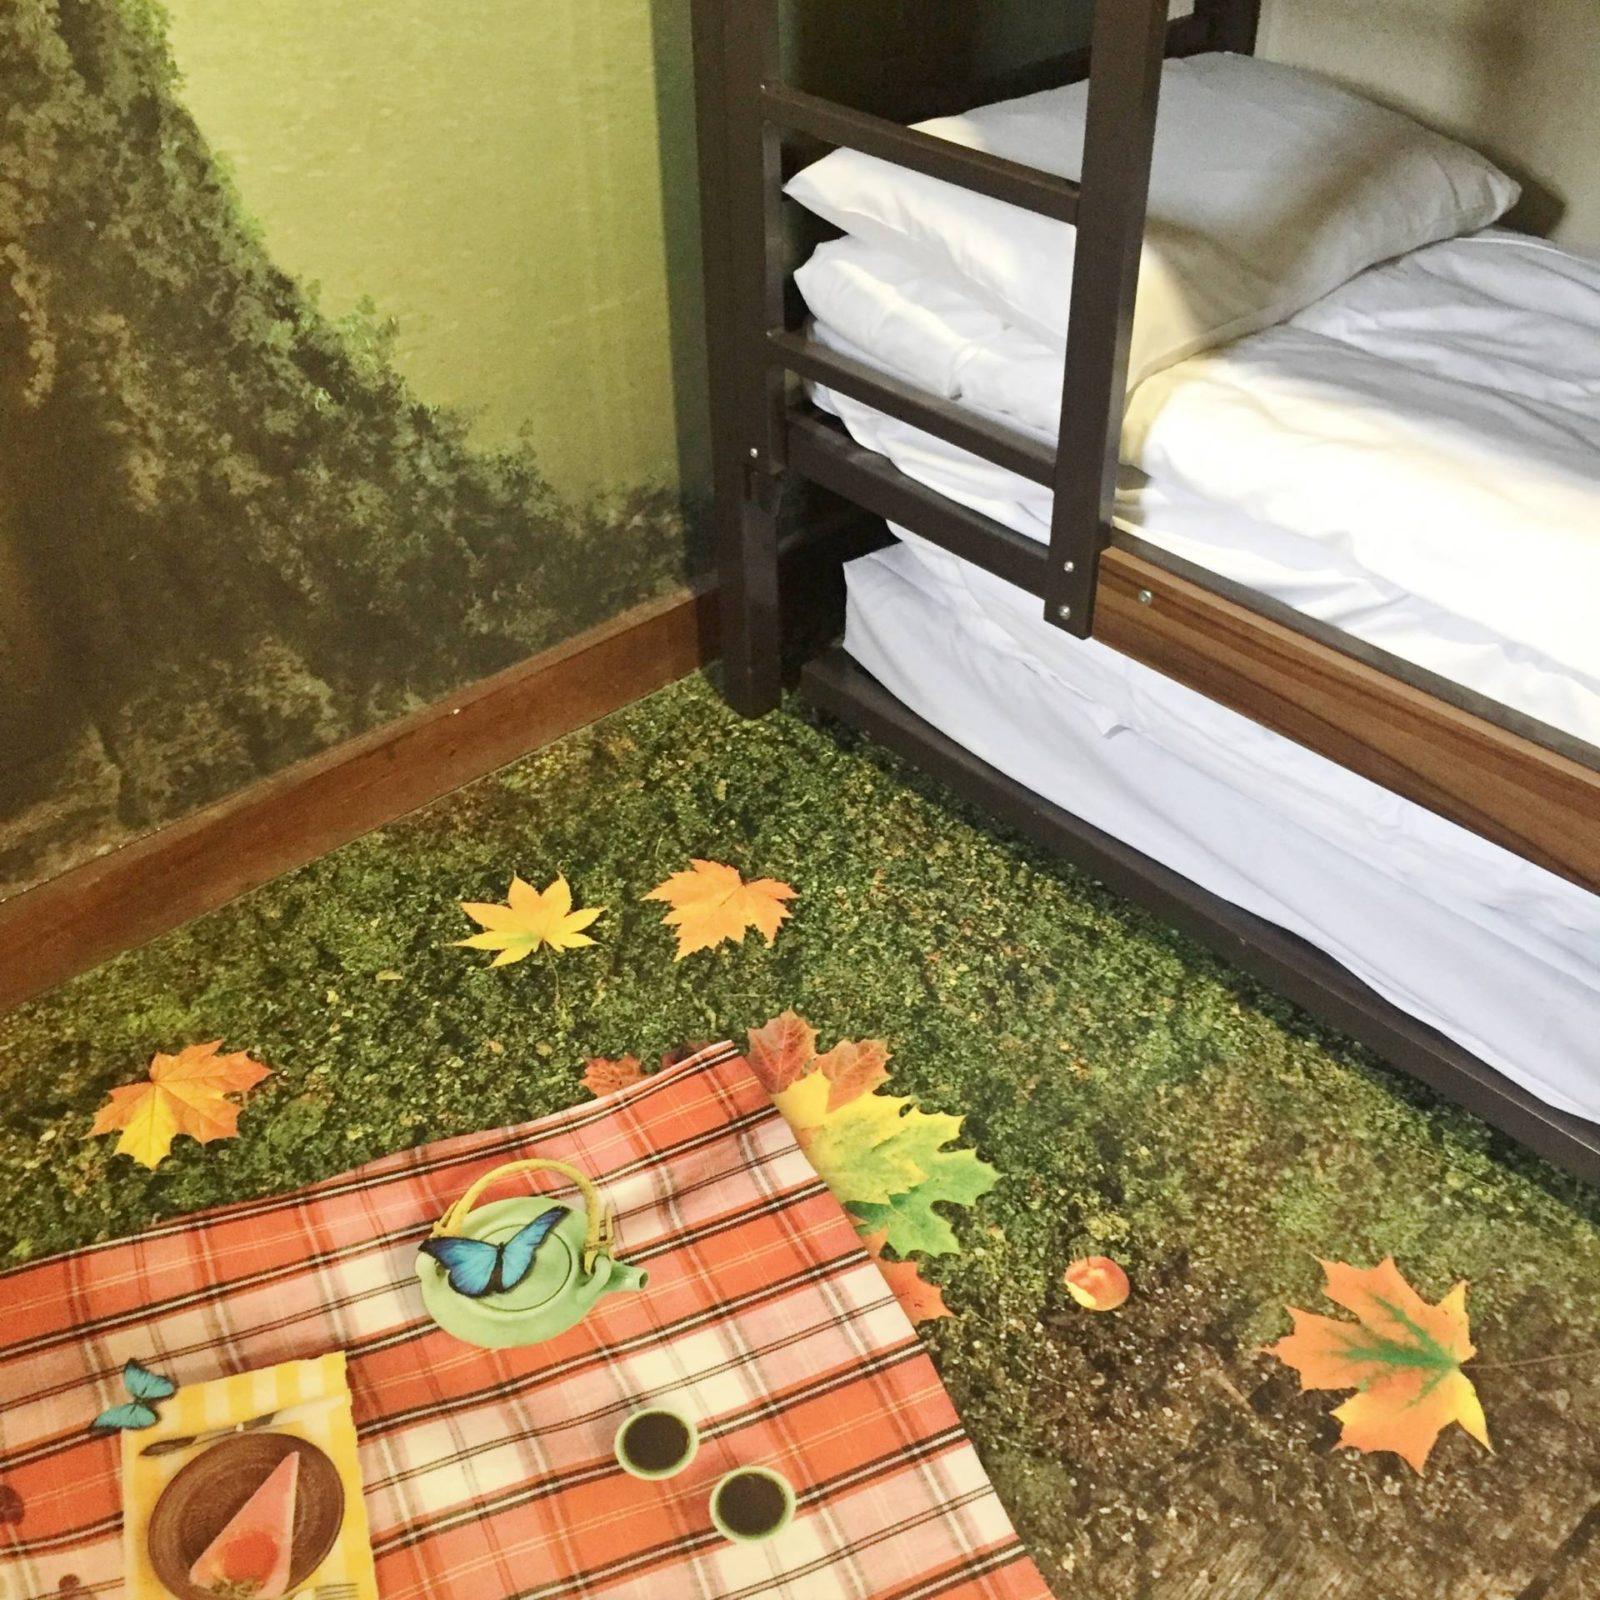 Emma Victoria Stokes Enchanted Lodges Alton Towers Garden